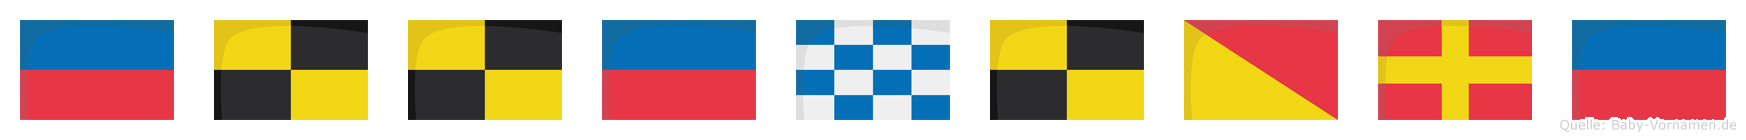 Ellenlore im Flaggenalphabet